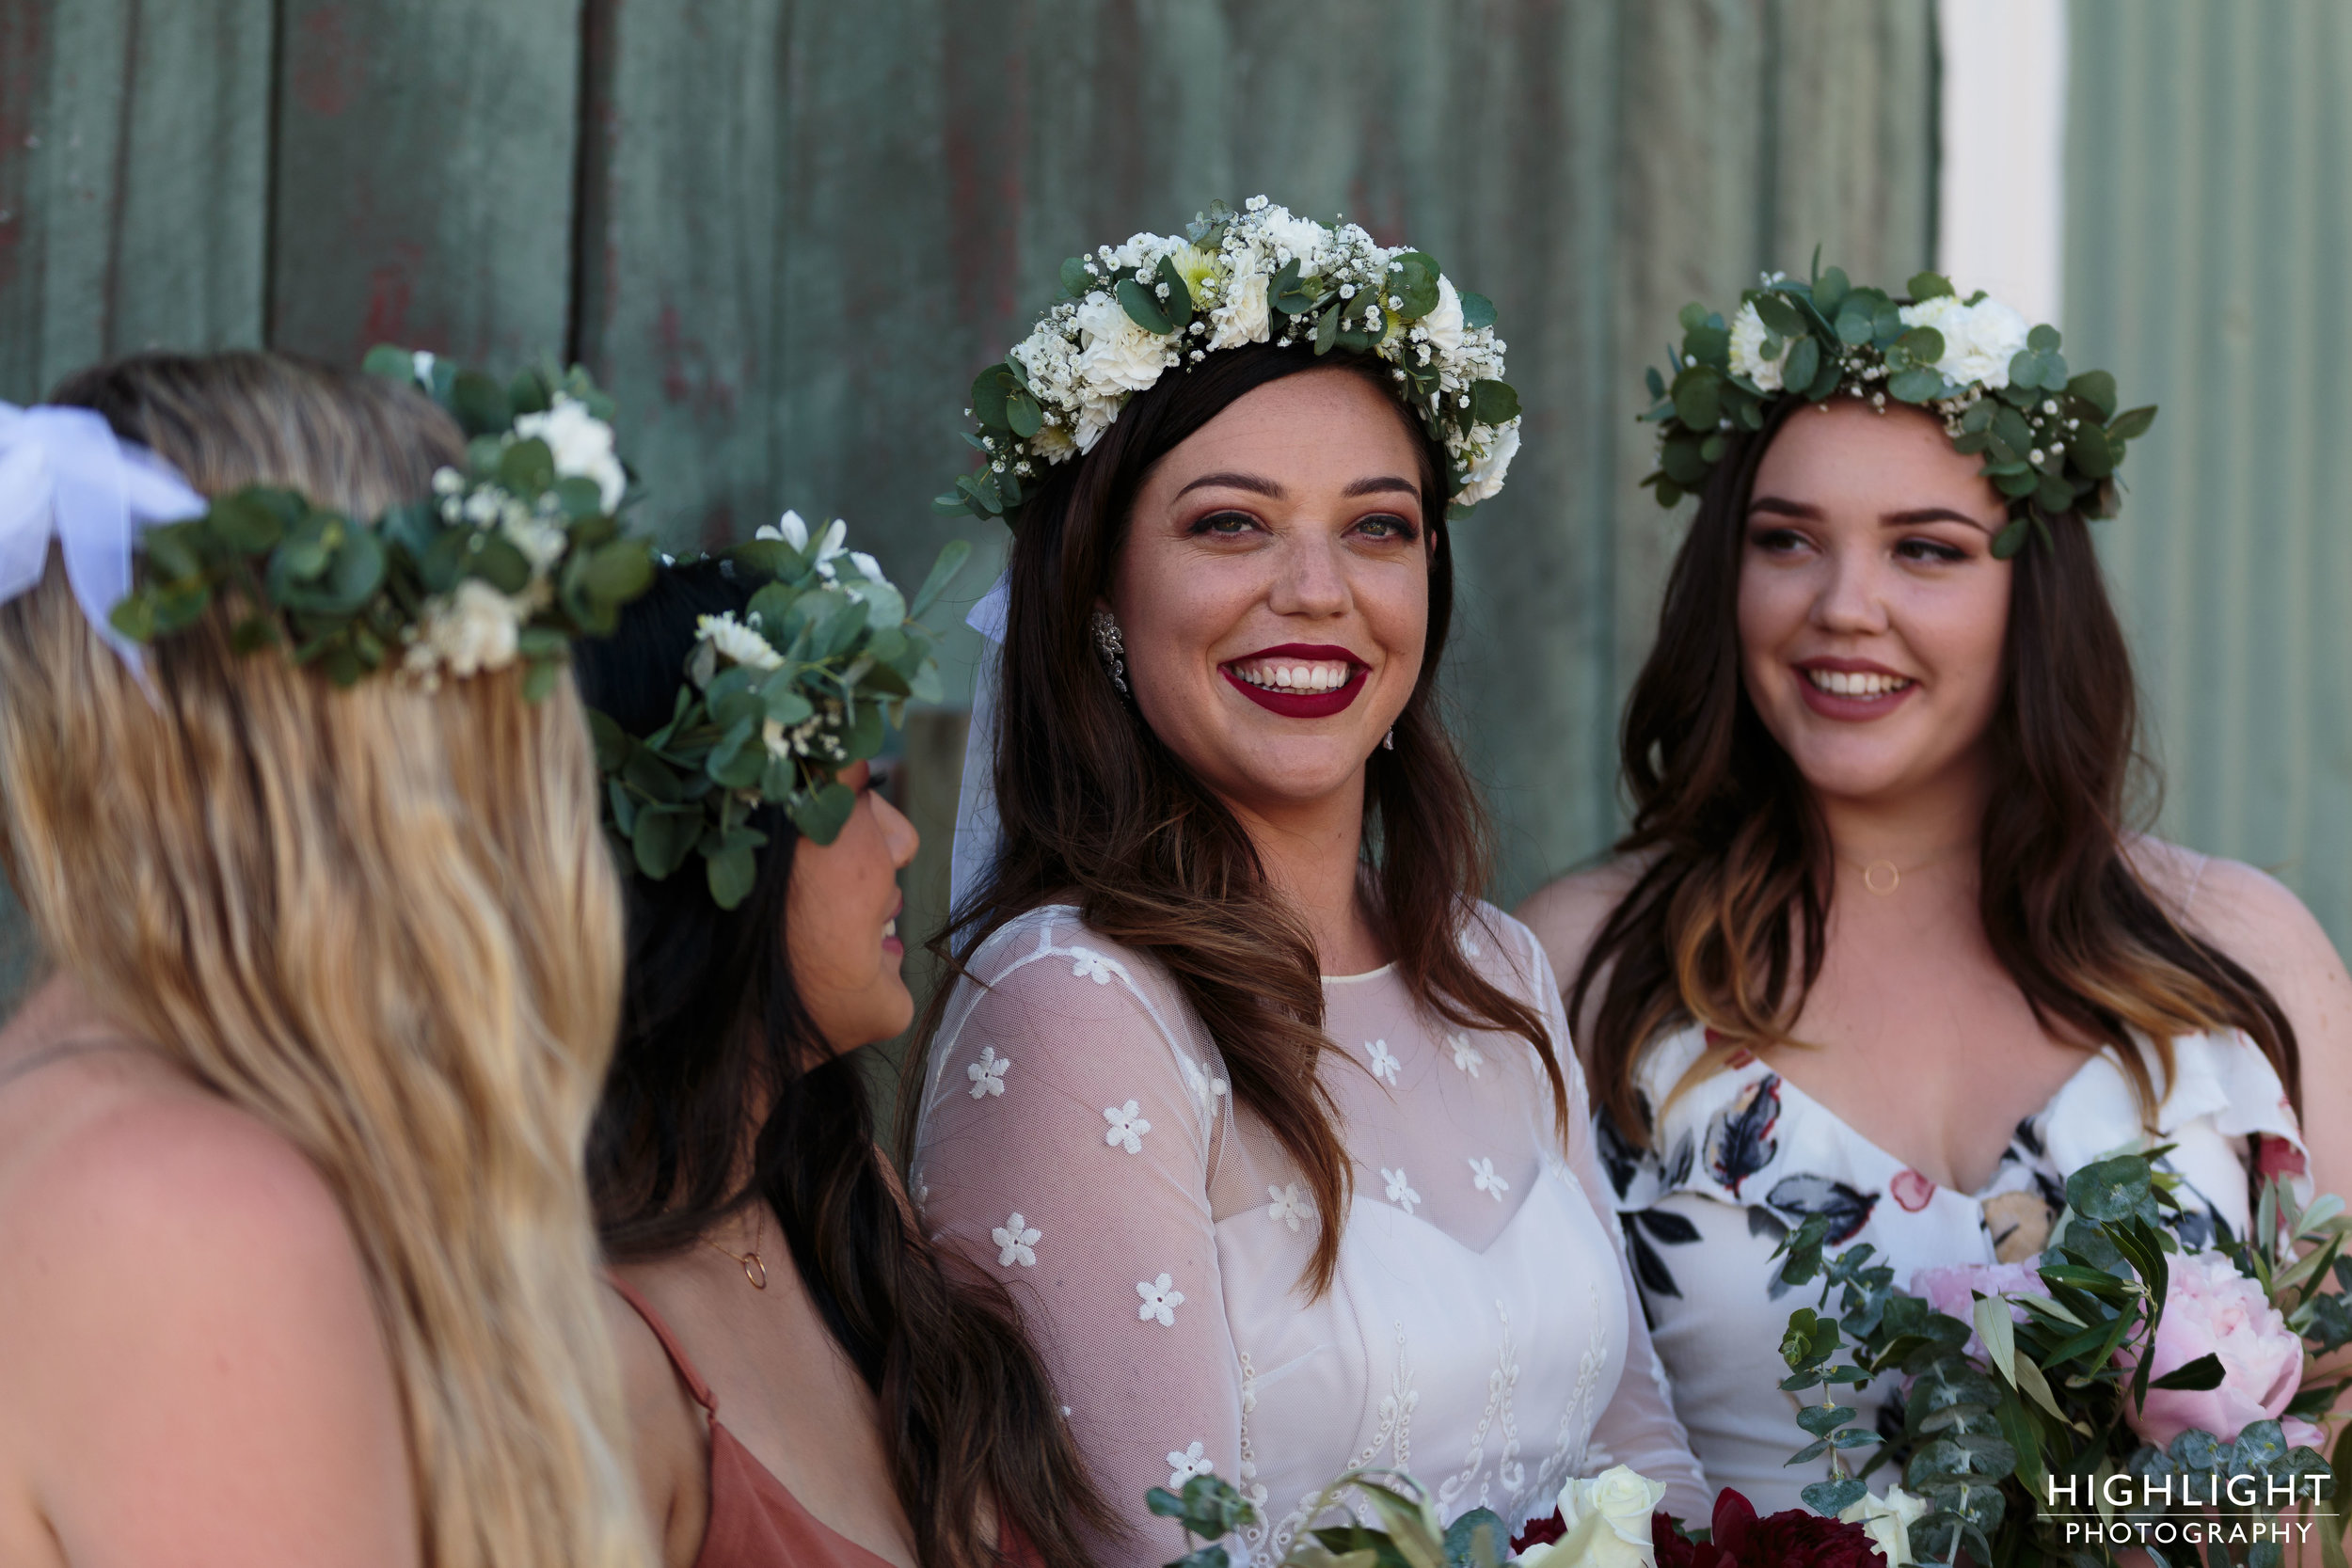 highlight-wedding-photography-new-zealand-makoura-lodge-wedding-117.jpg